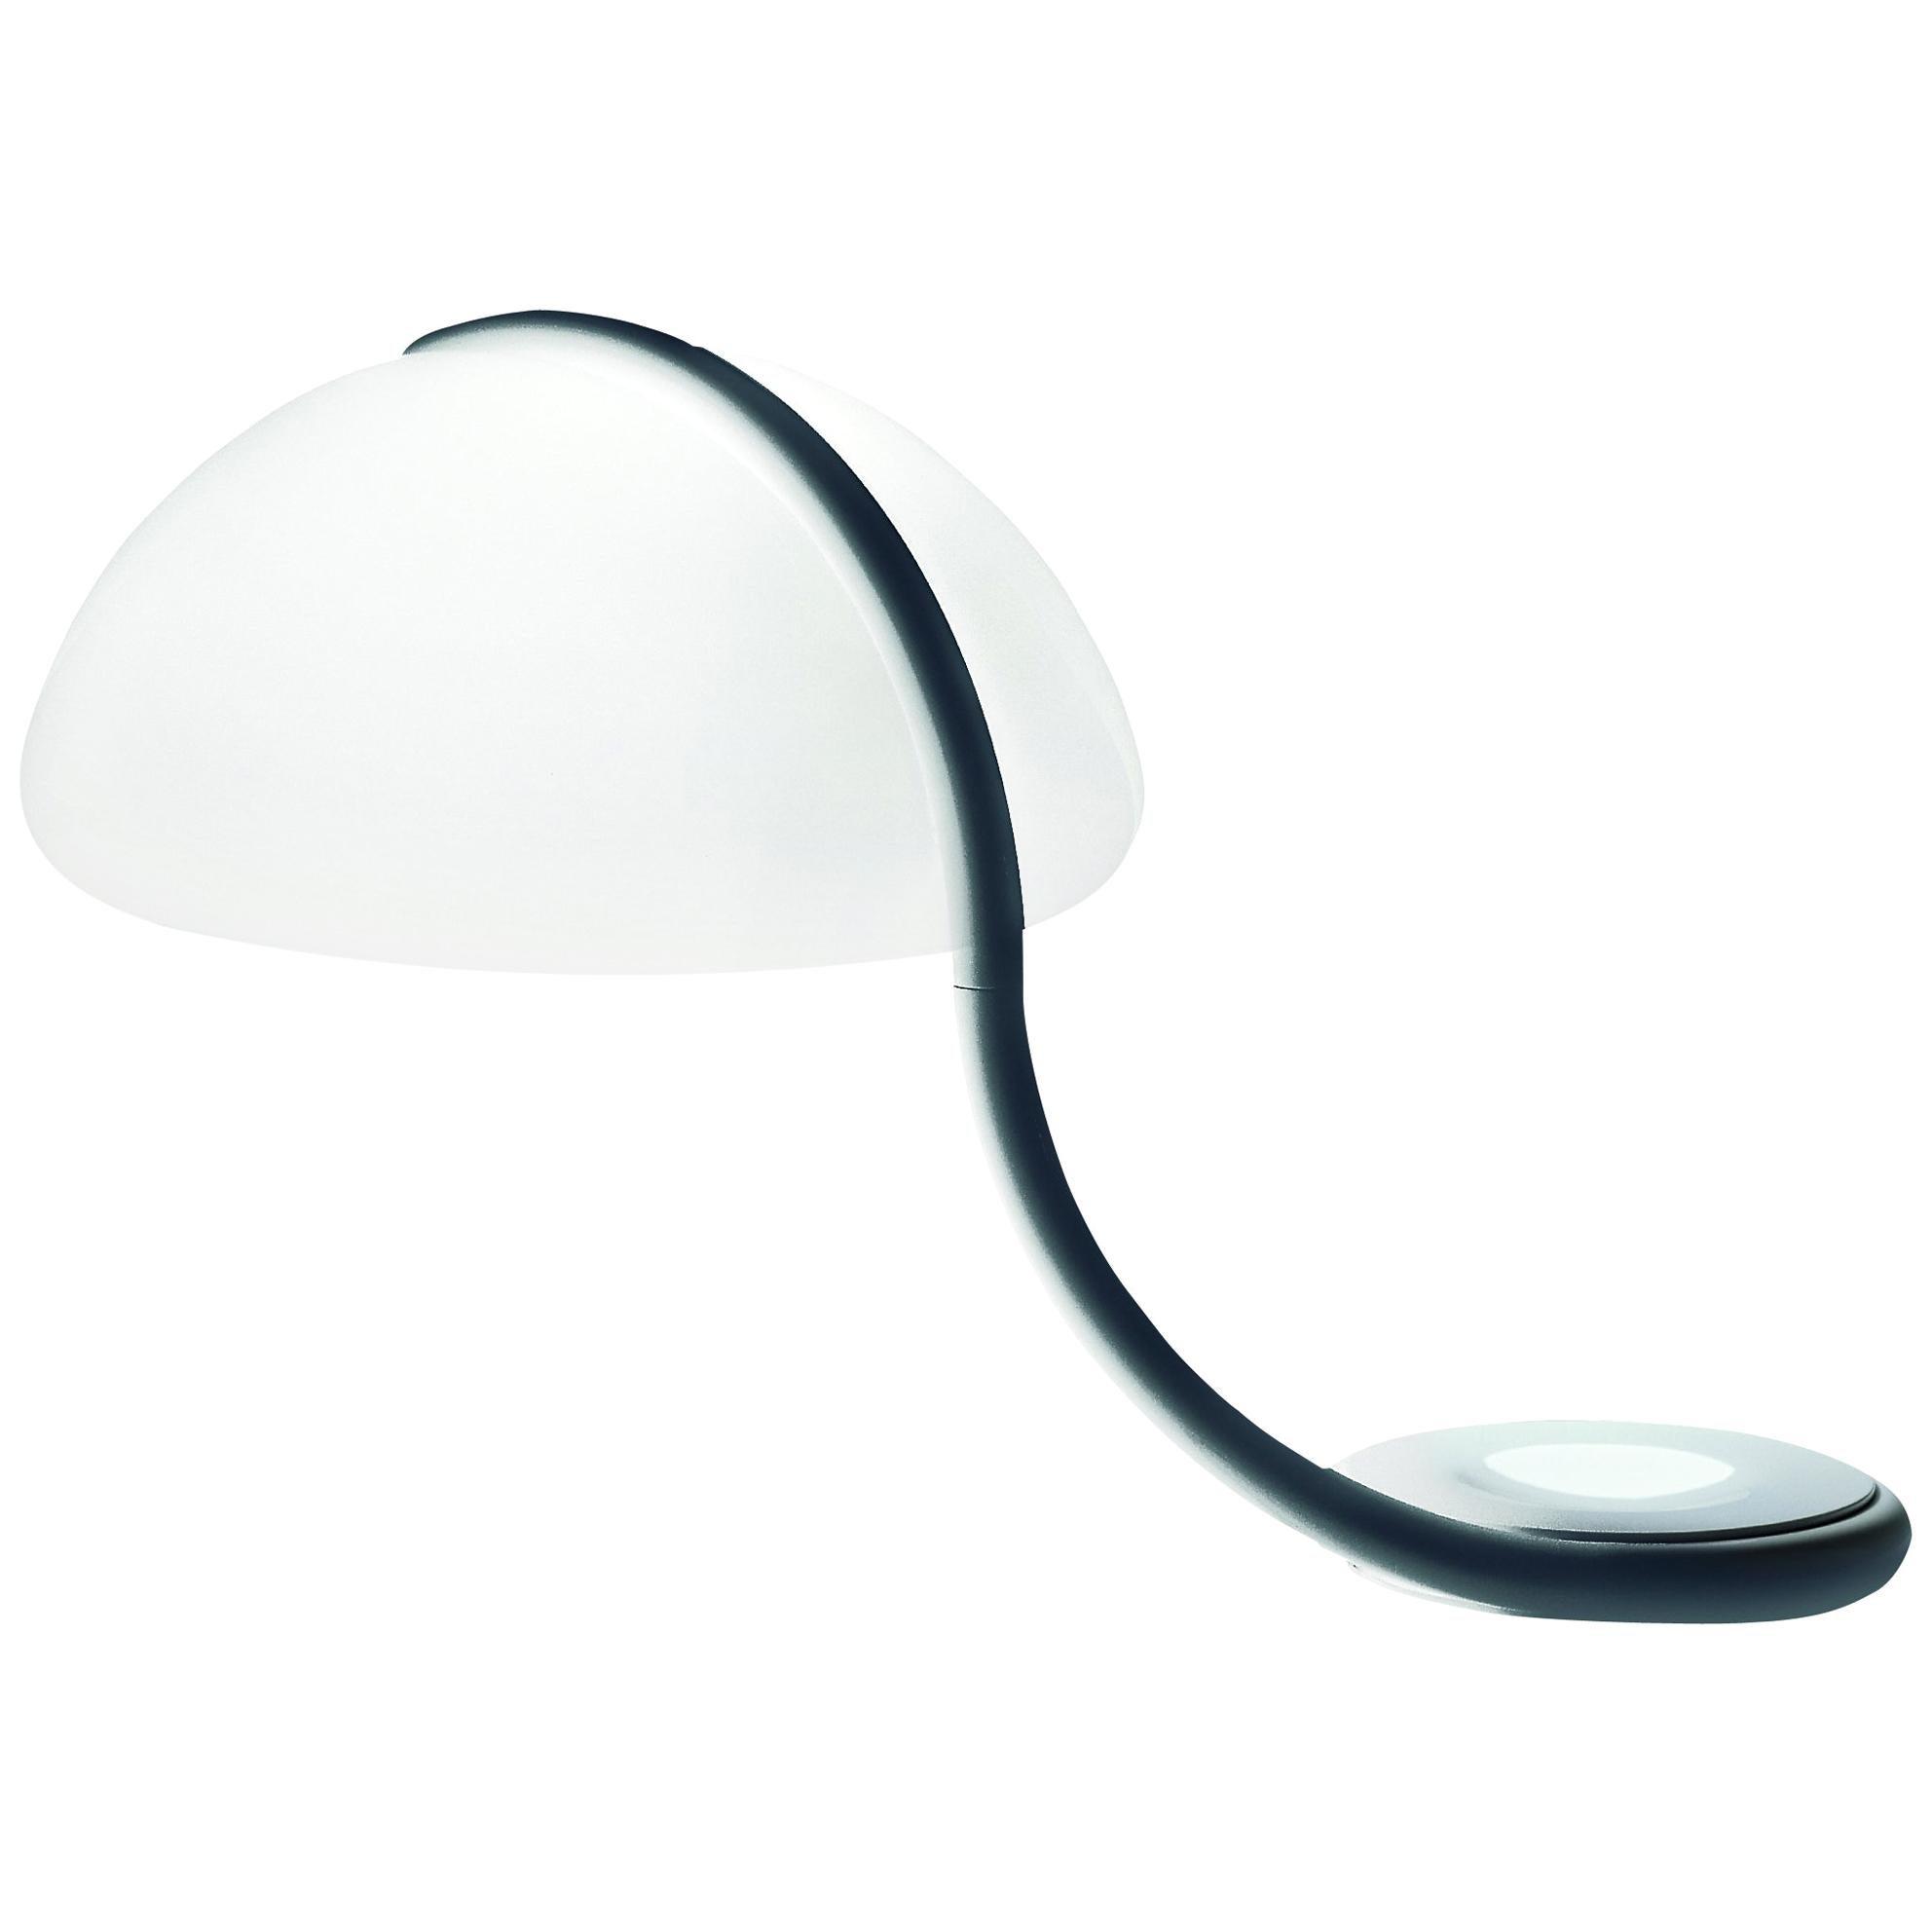 Martinelli Luce Serpente 599 Table Lamp by Elio Martinelli